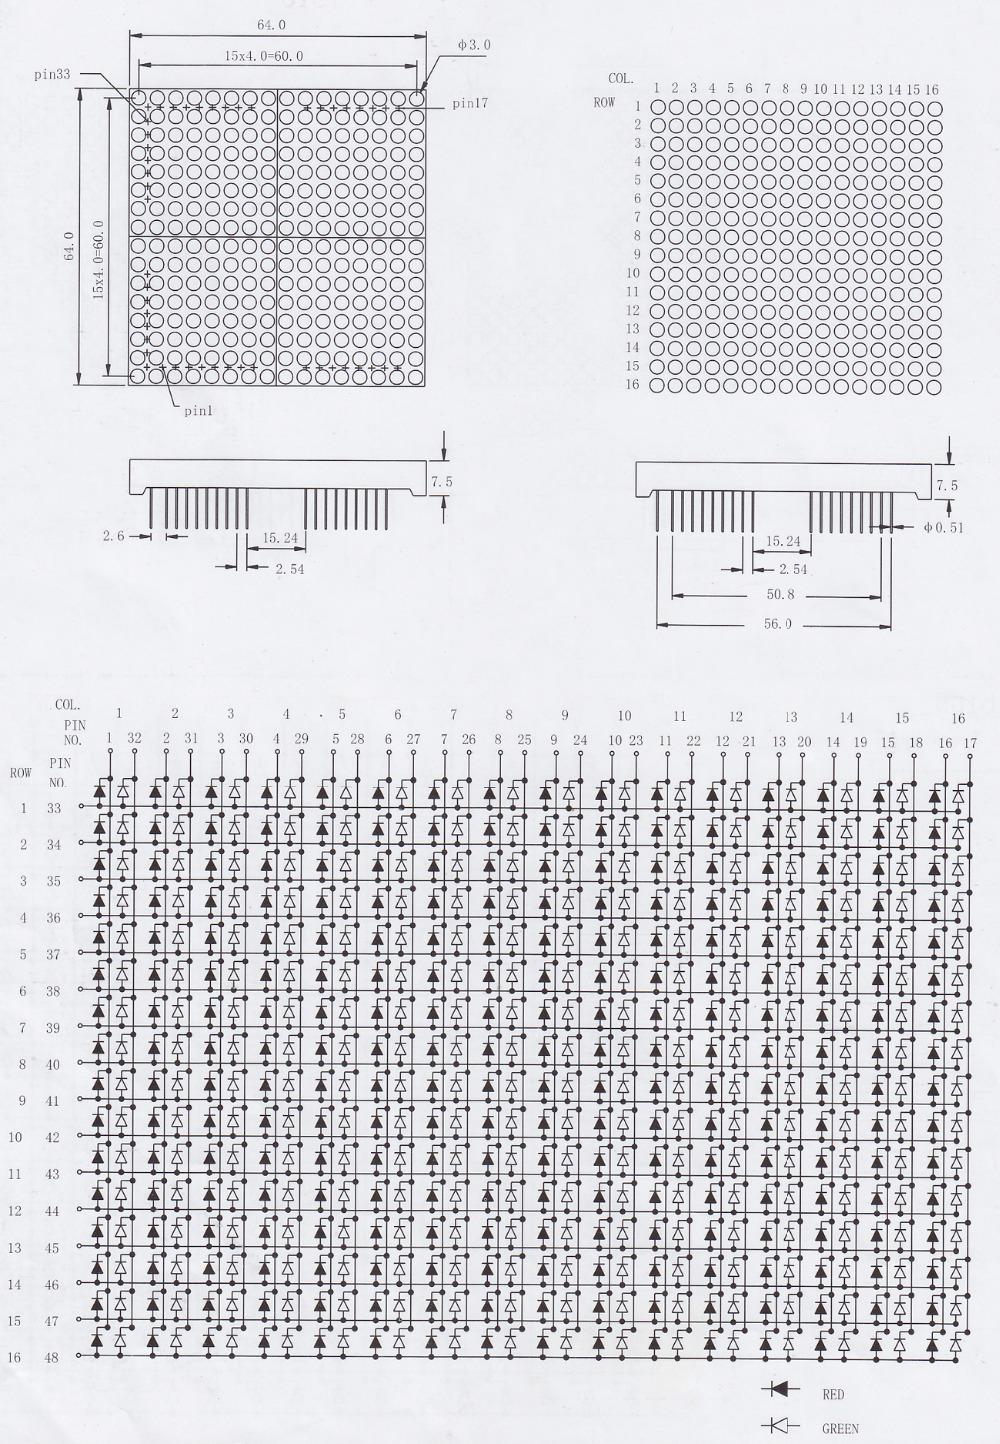 LED matrix 16x16 dot matrix display led matrix 16*16